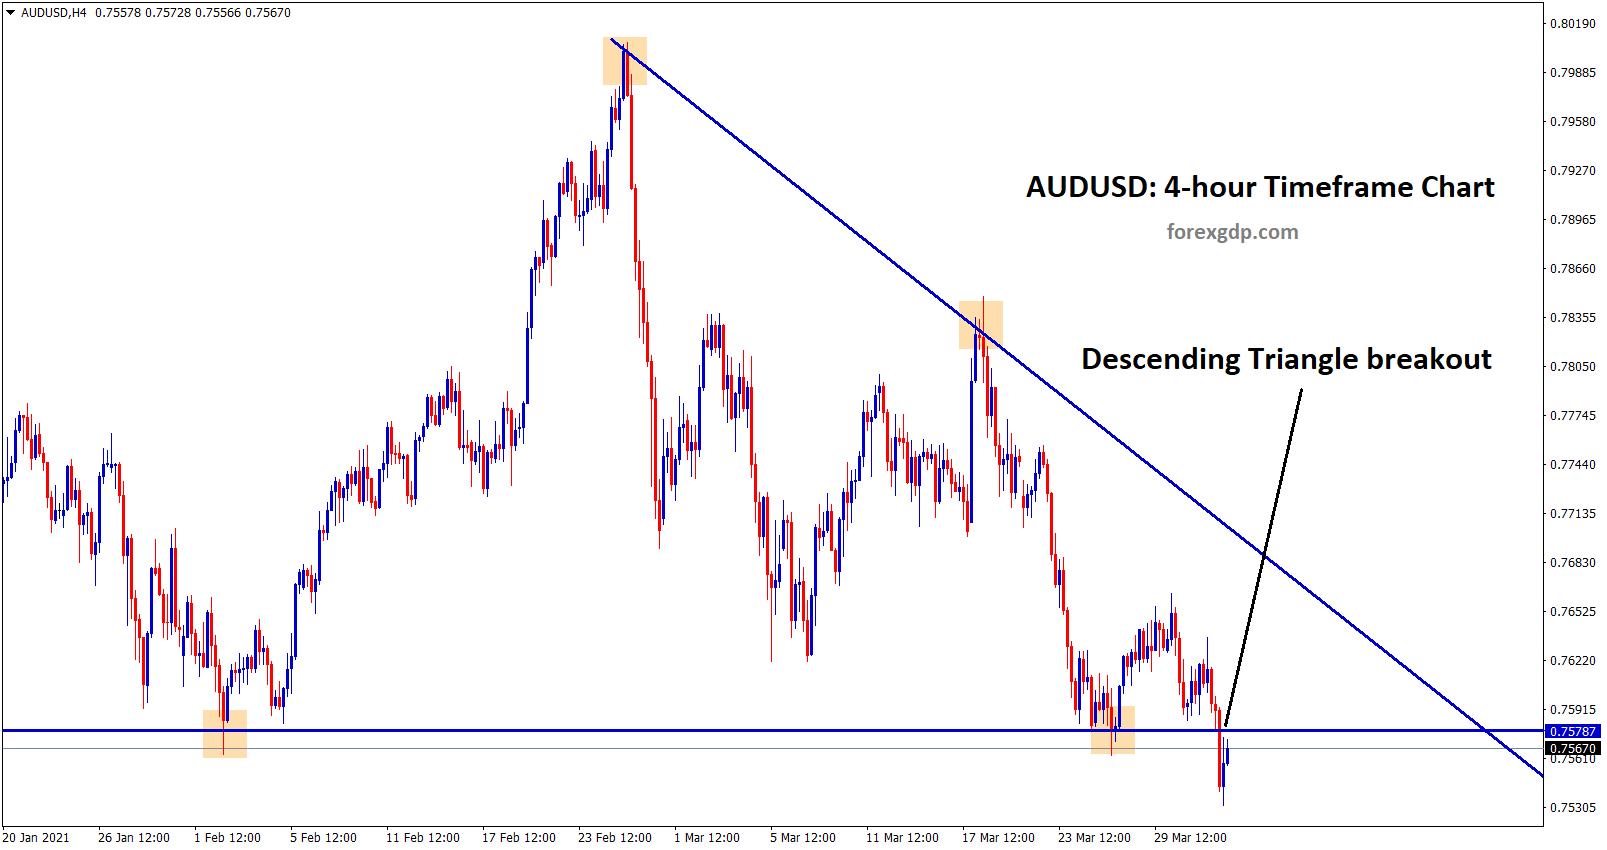 AUDUSD has broken the bottom level of the descending triangle